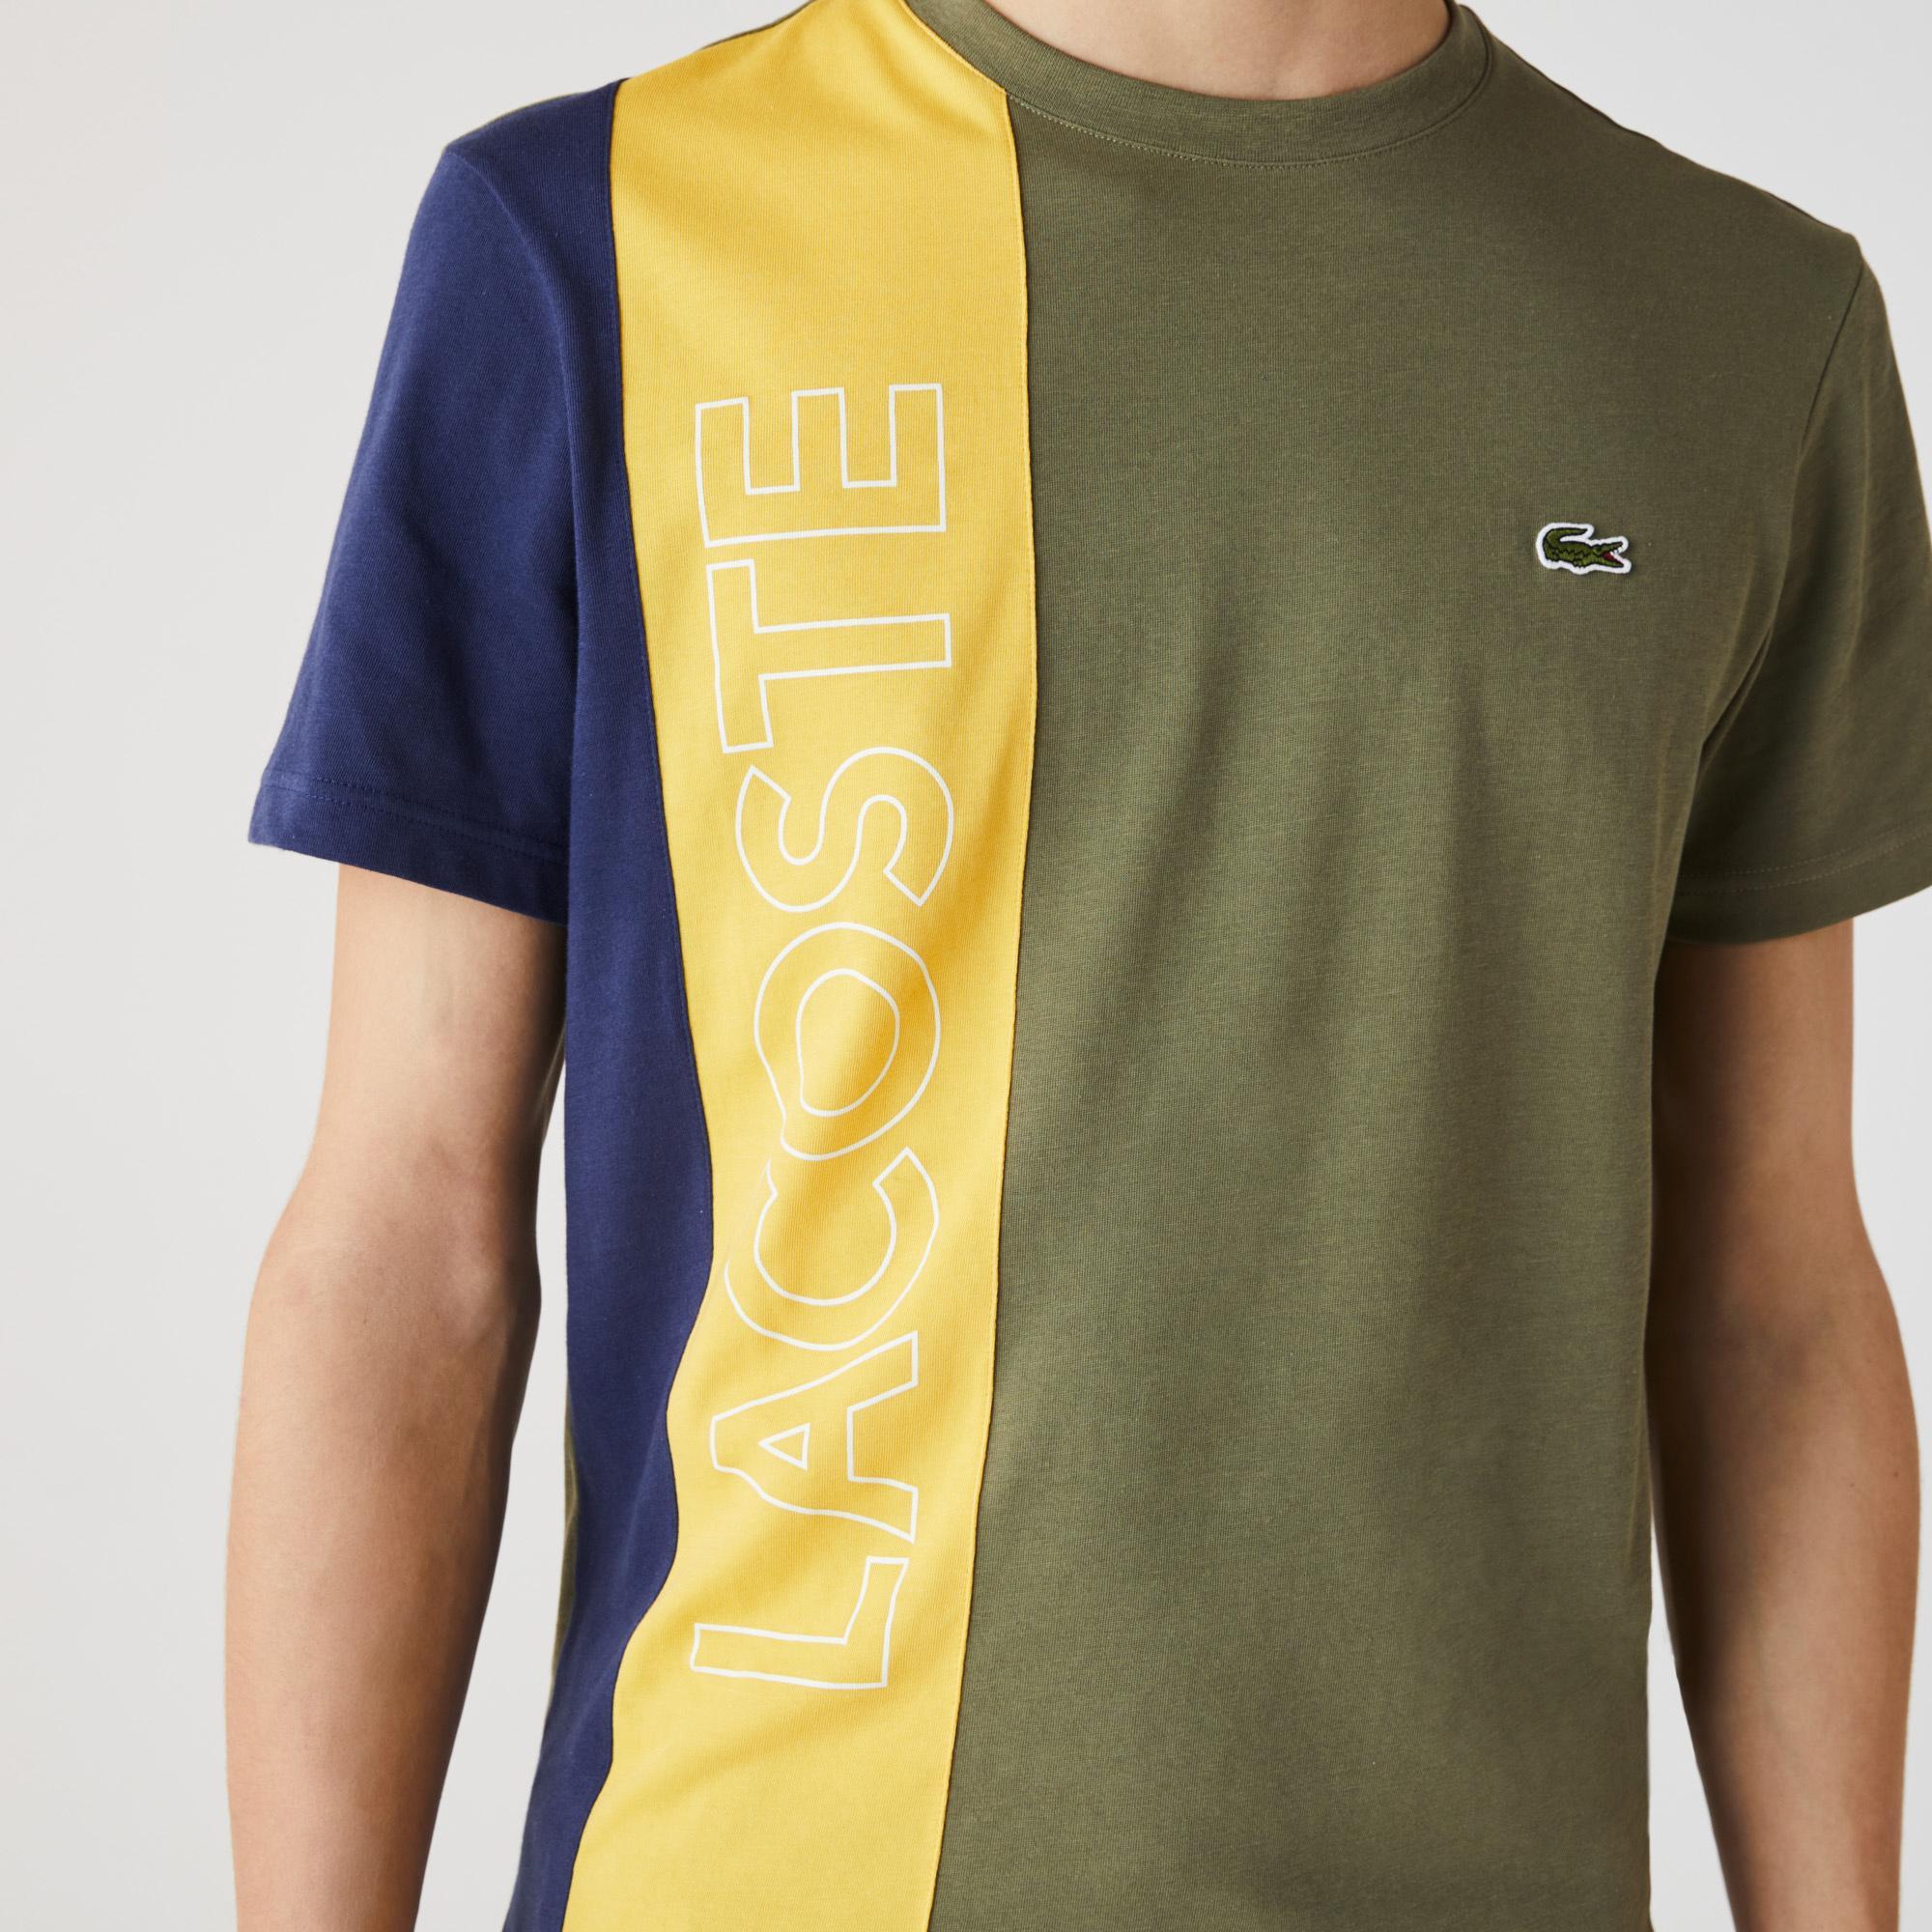 Lacoste Erkek Regular Fit Bisiklet Yaka Baskılı Renk Bloklu Renkli T-Shirt